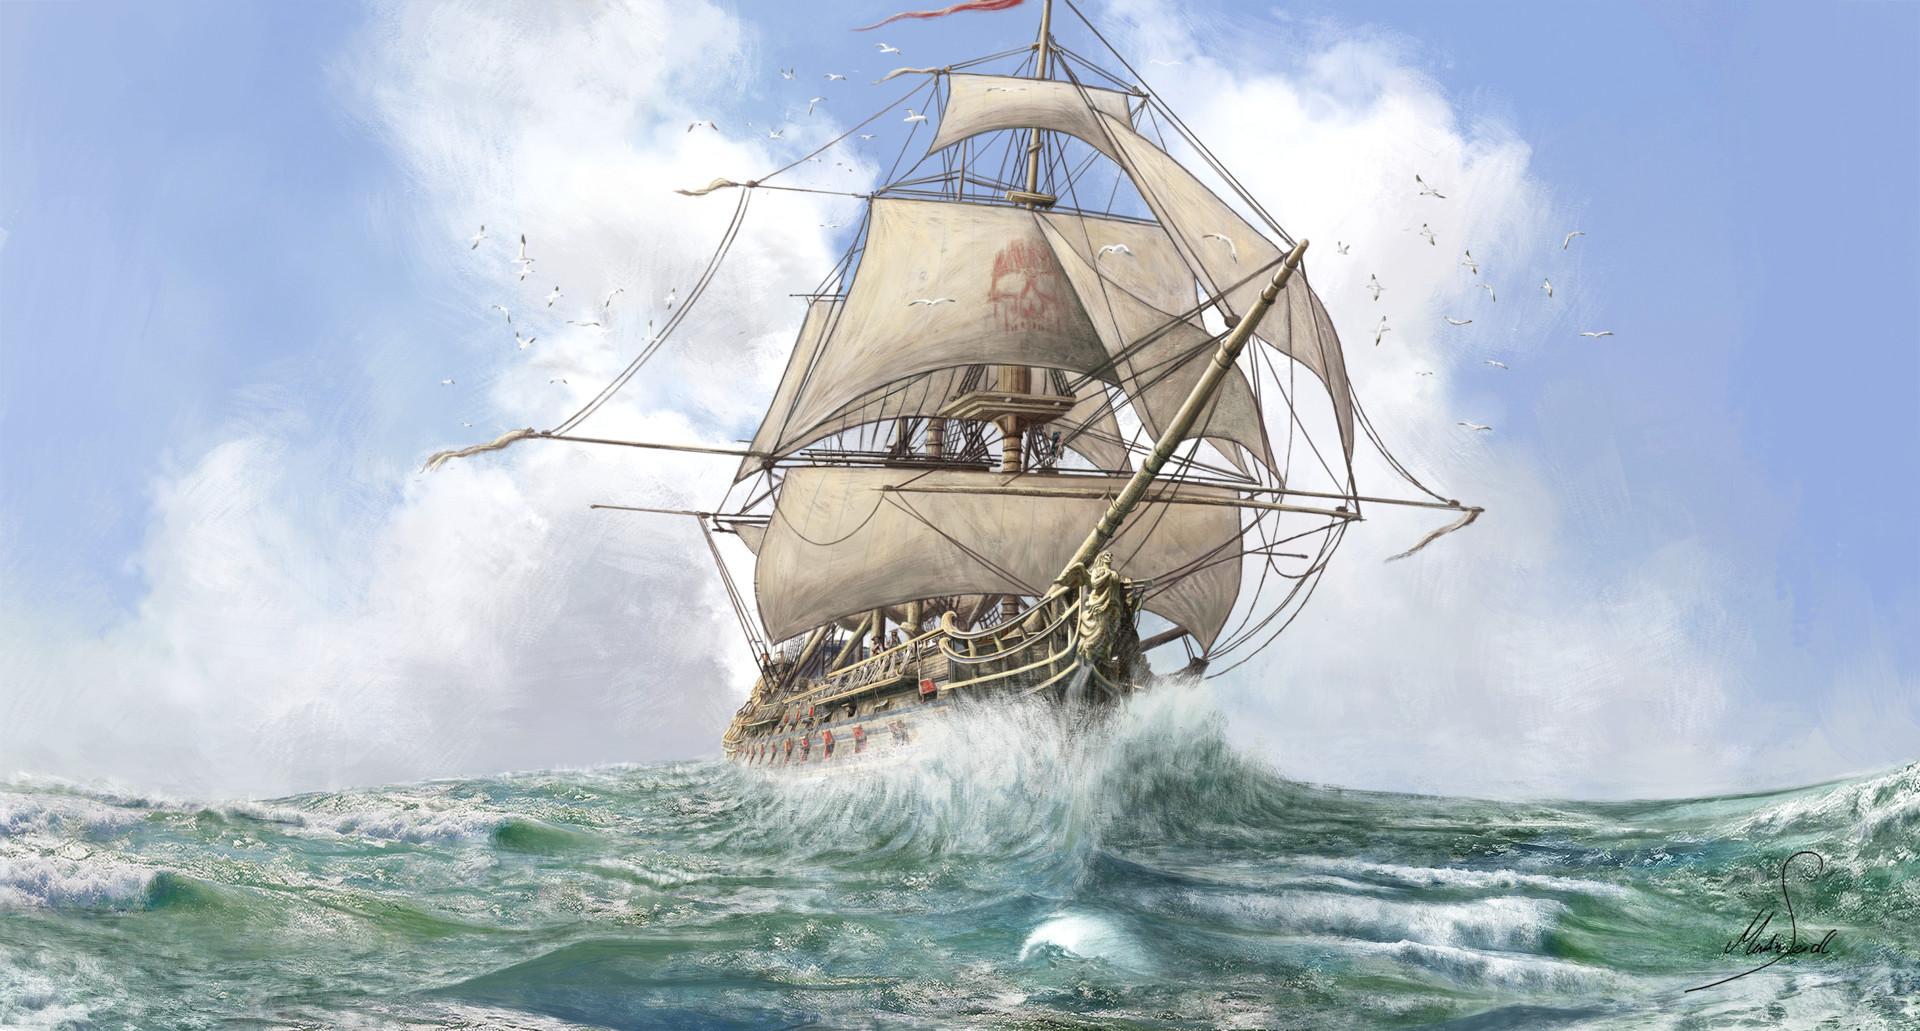 Martin seidl fancy pirate ship mindre artstation